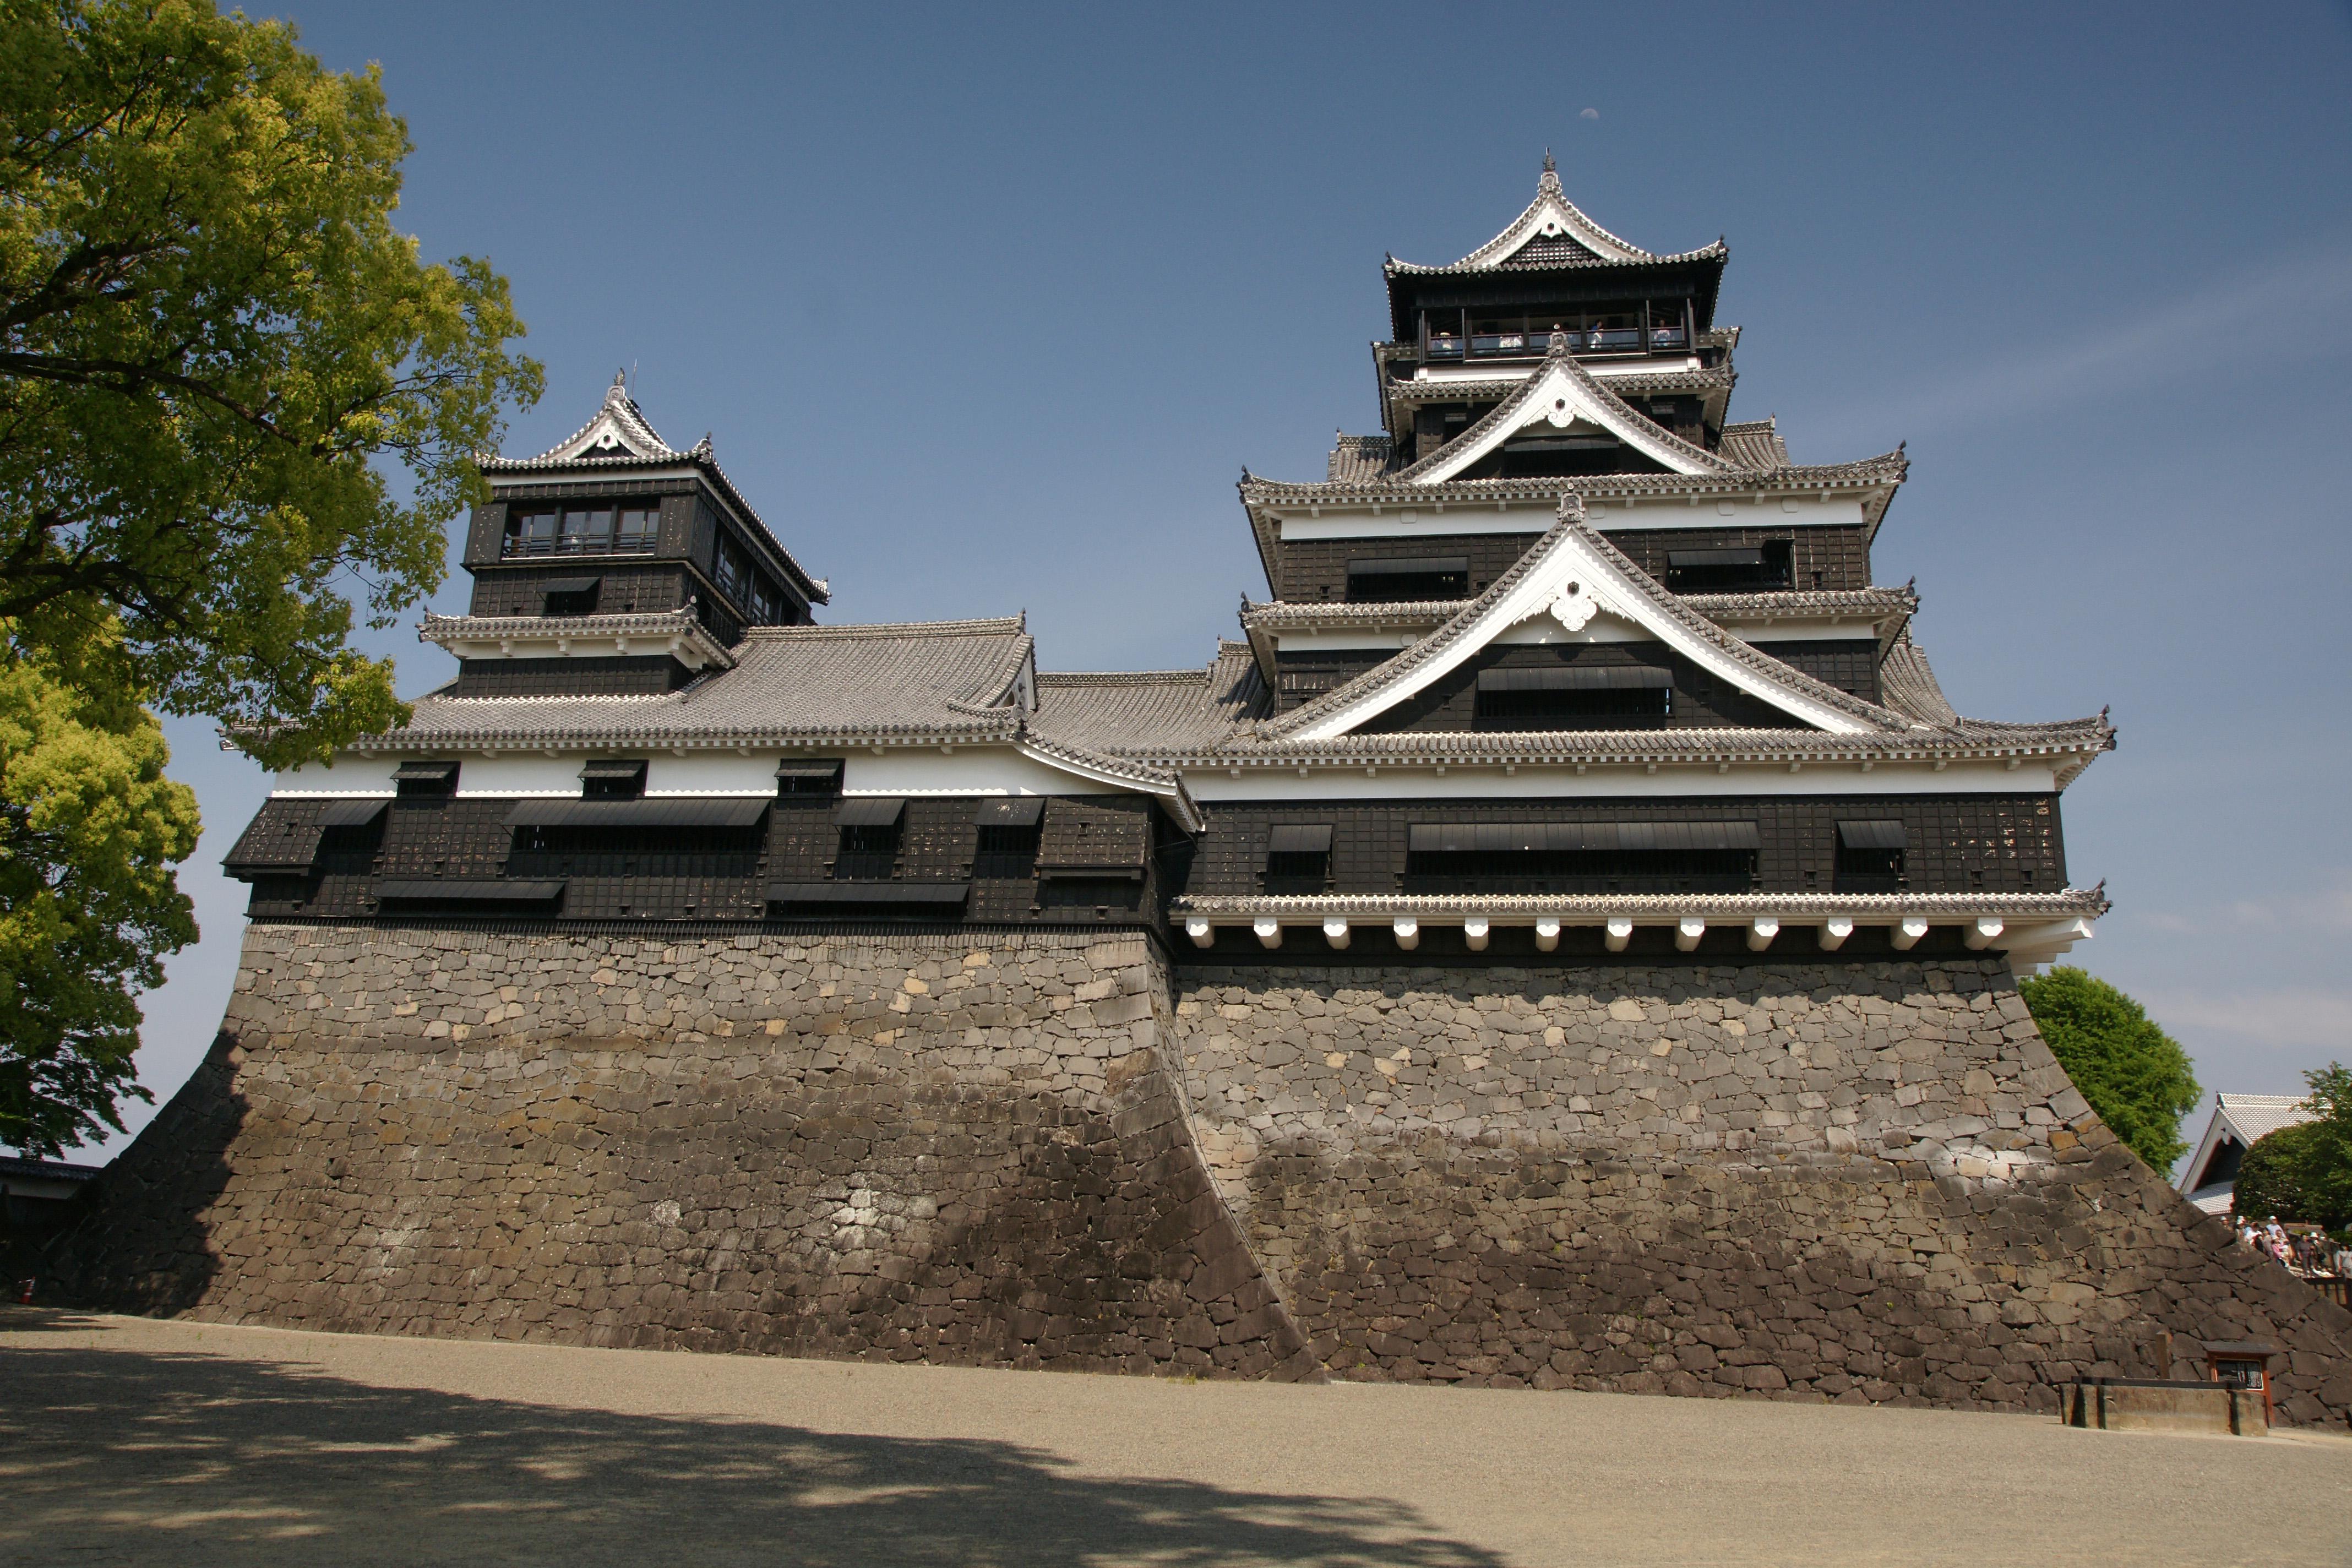 Most impressive Japan castle